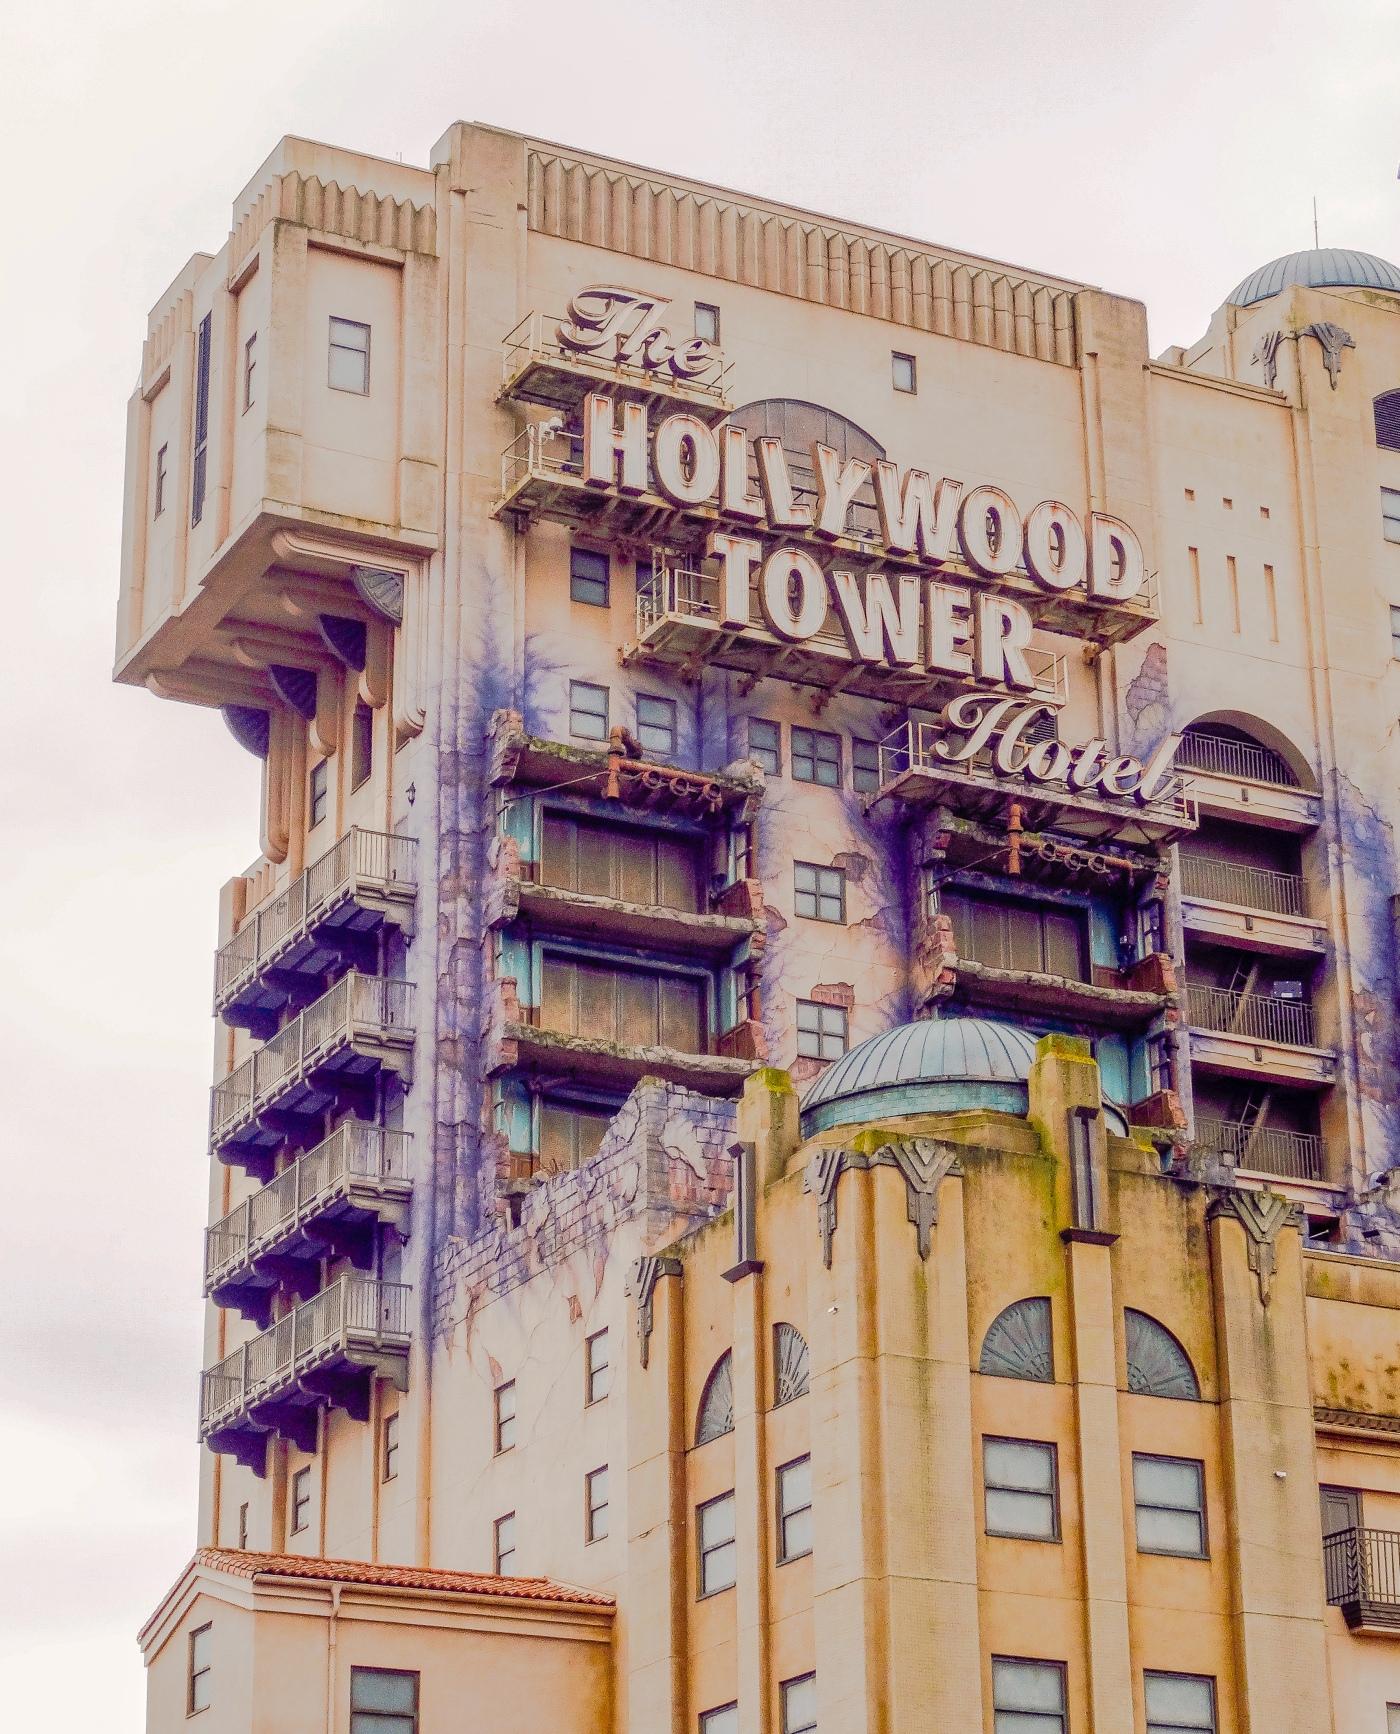 The Twilight Zone Tower of Terror in the Walt Disney Studios Park at Disneyland Paris